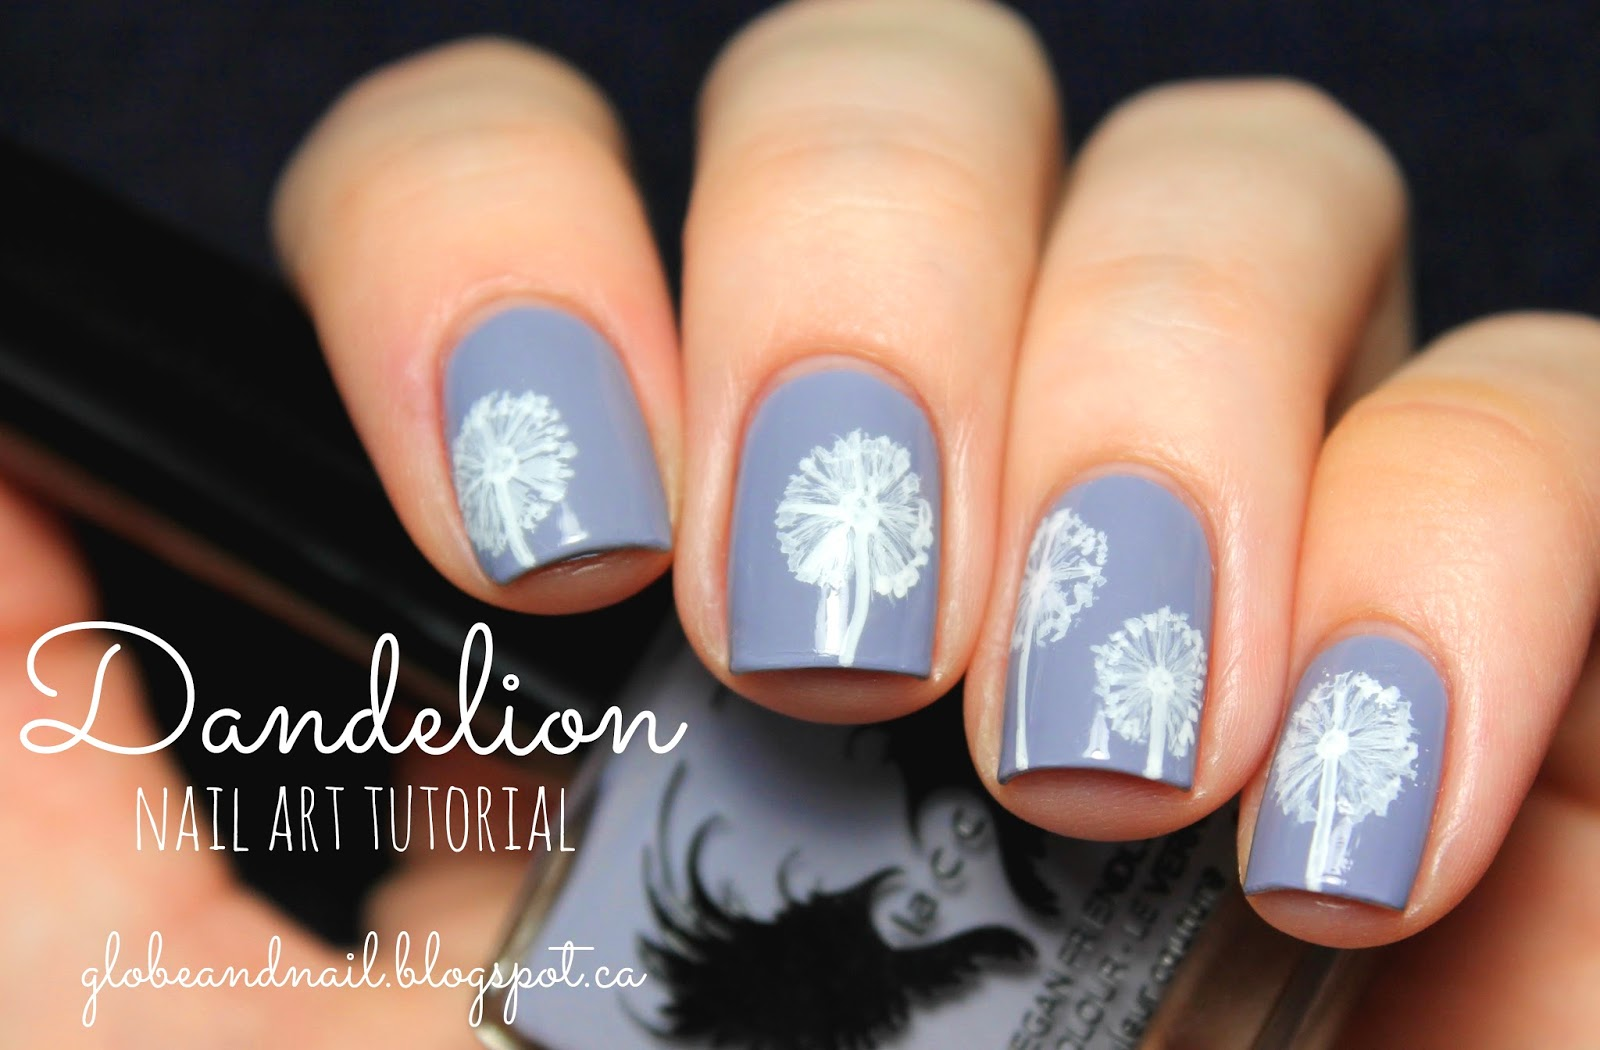 Globe & Nail: Dandelion Nail Art Tutorial